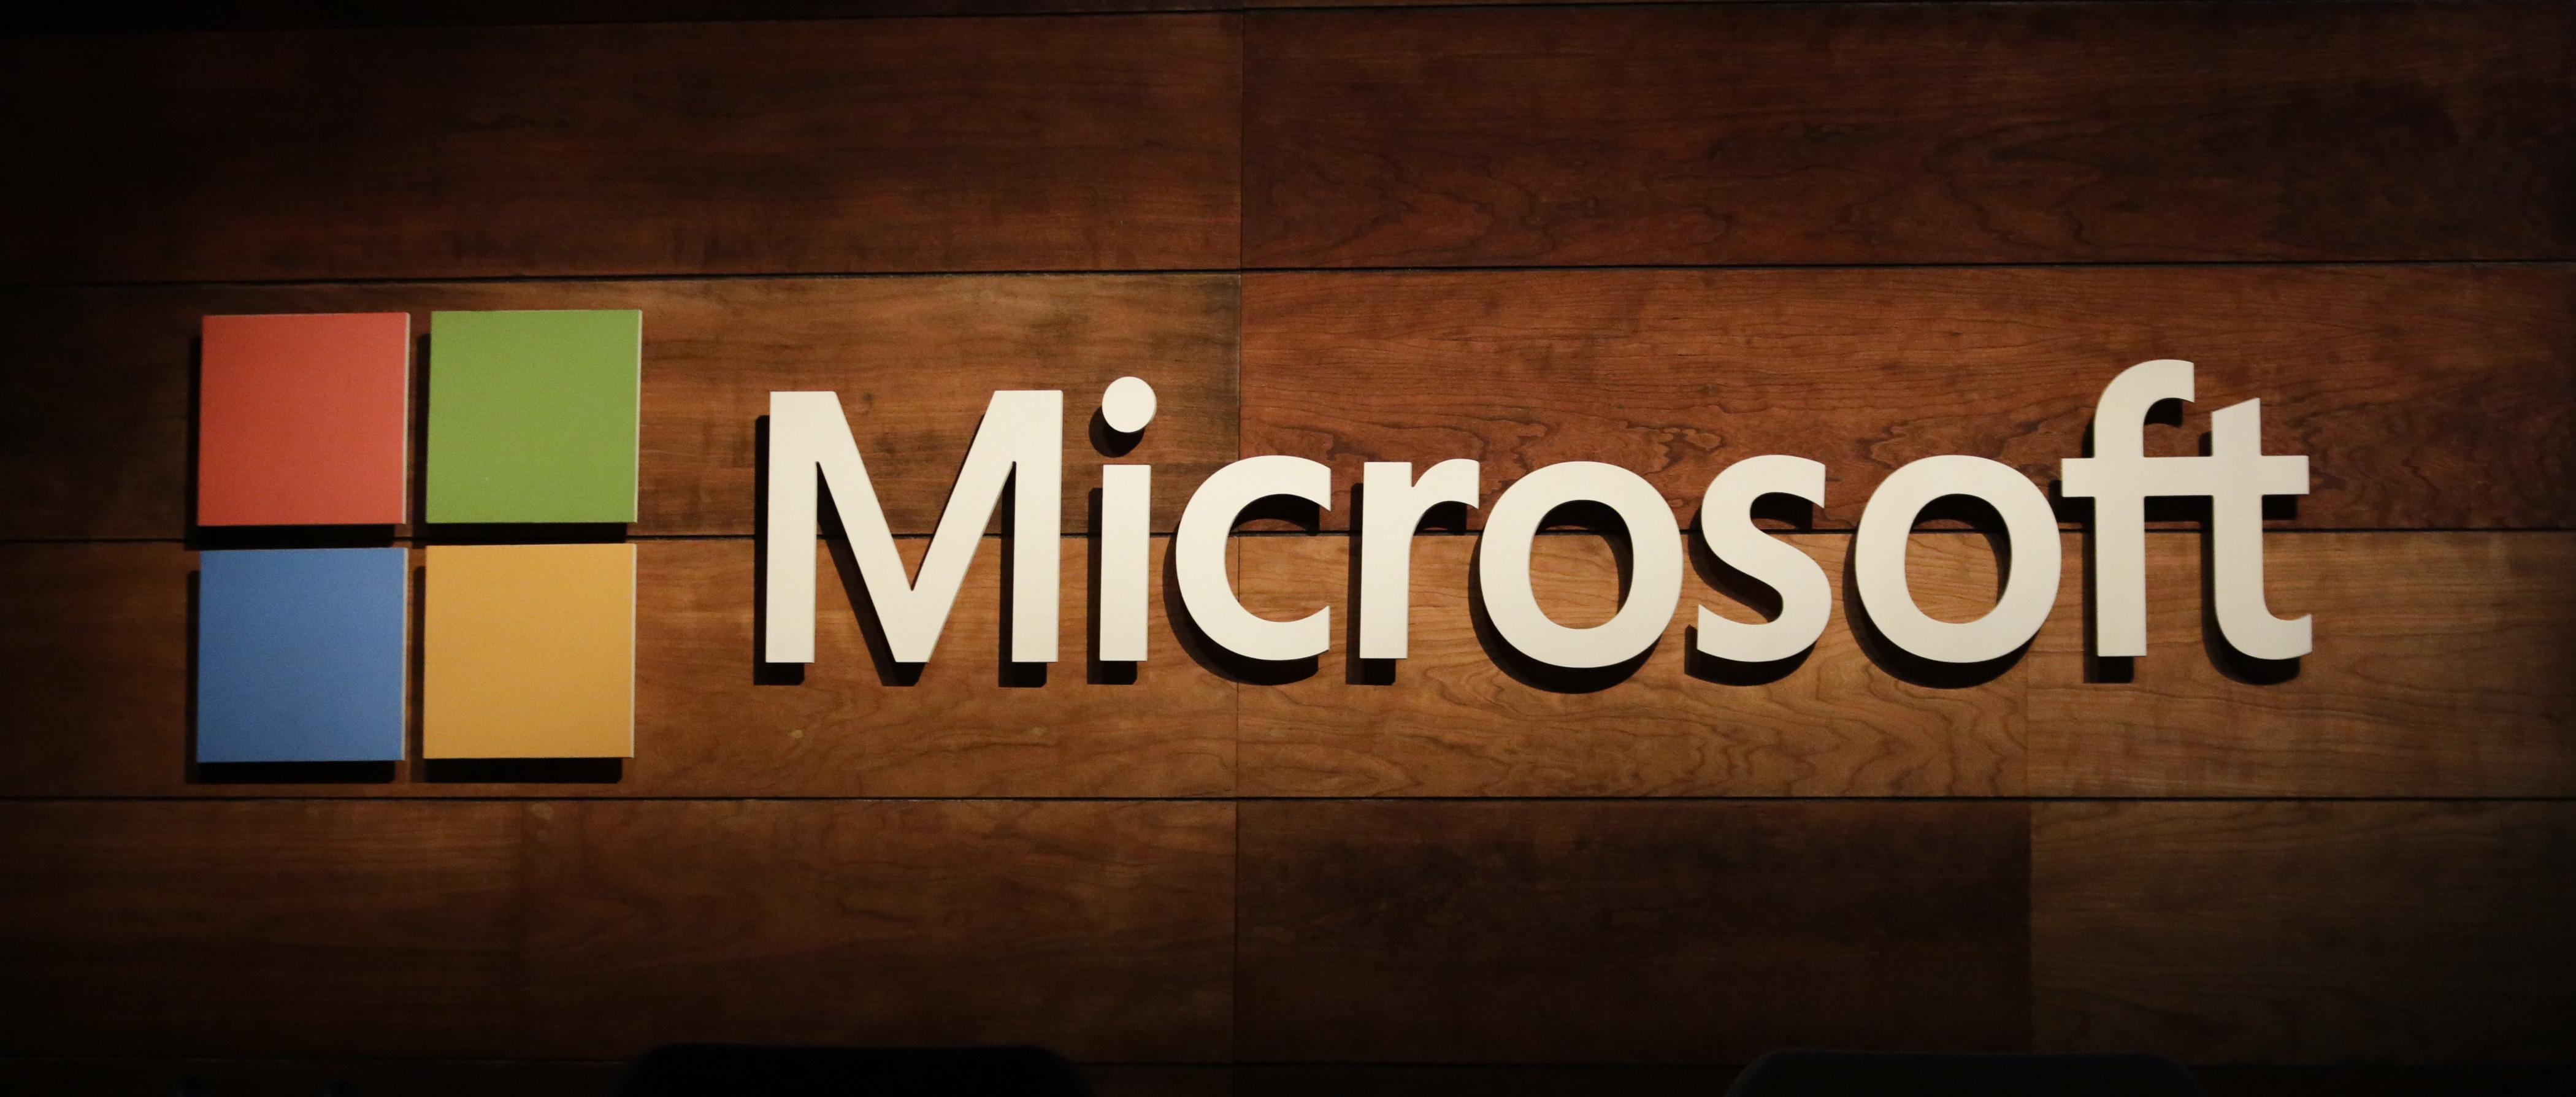 Kevin Johnson Microsoft executive